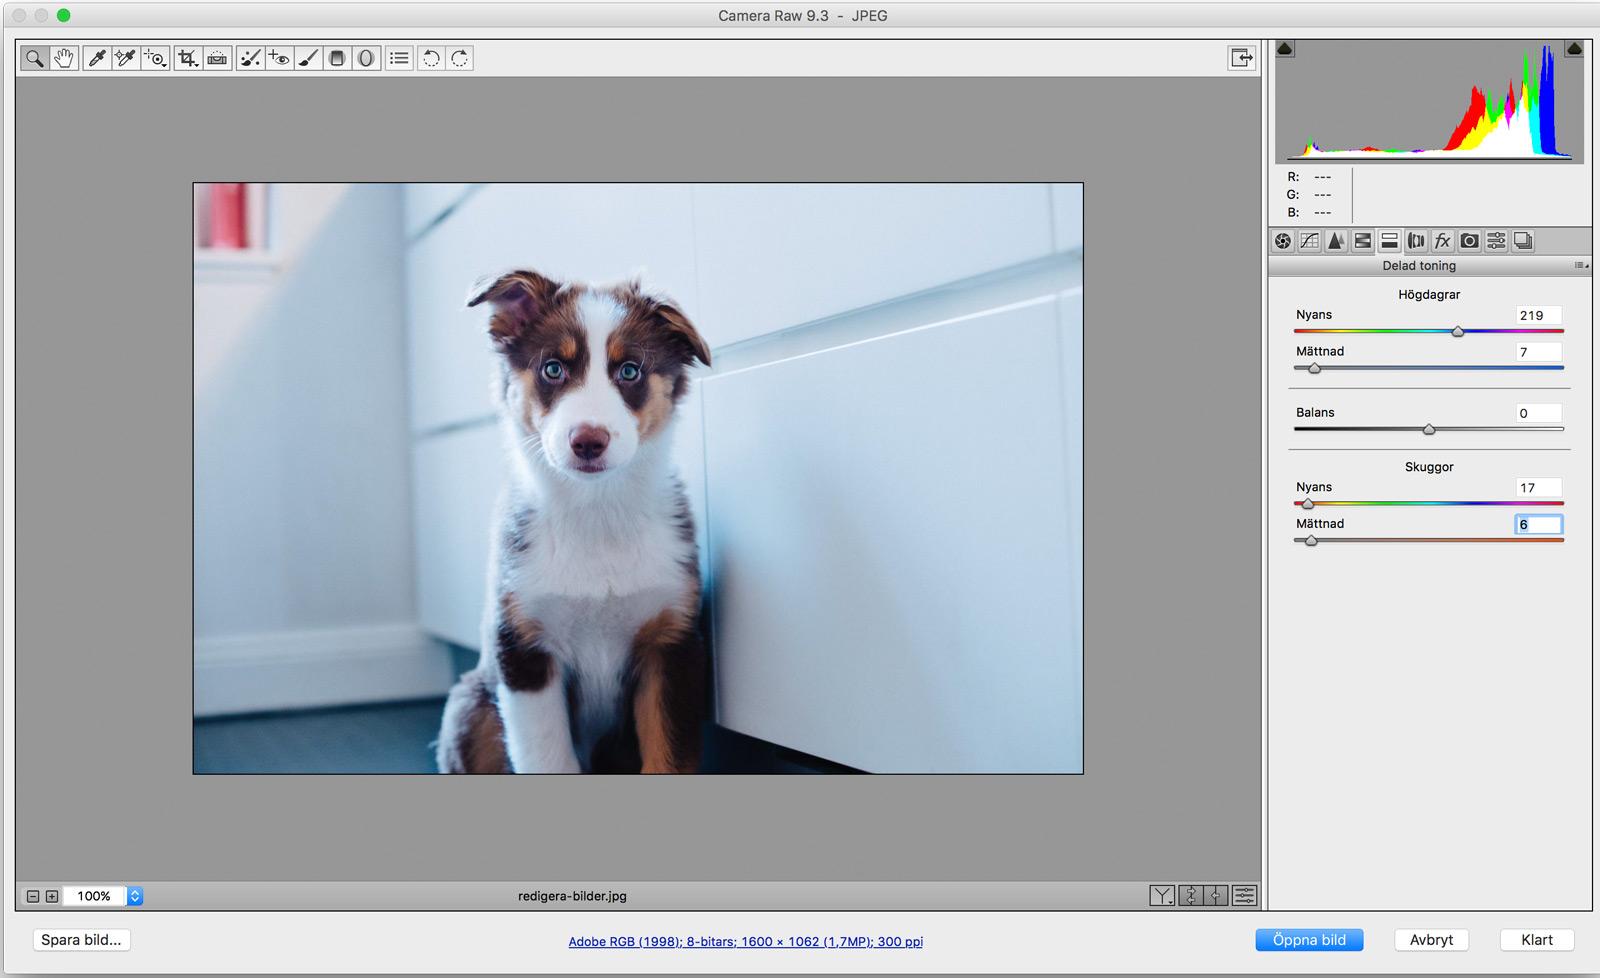 redigera-bilder-i-camera-raw